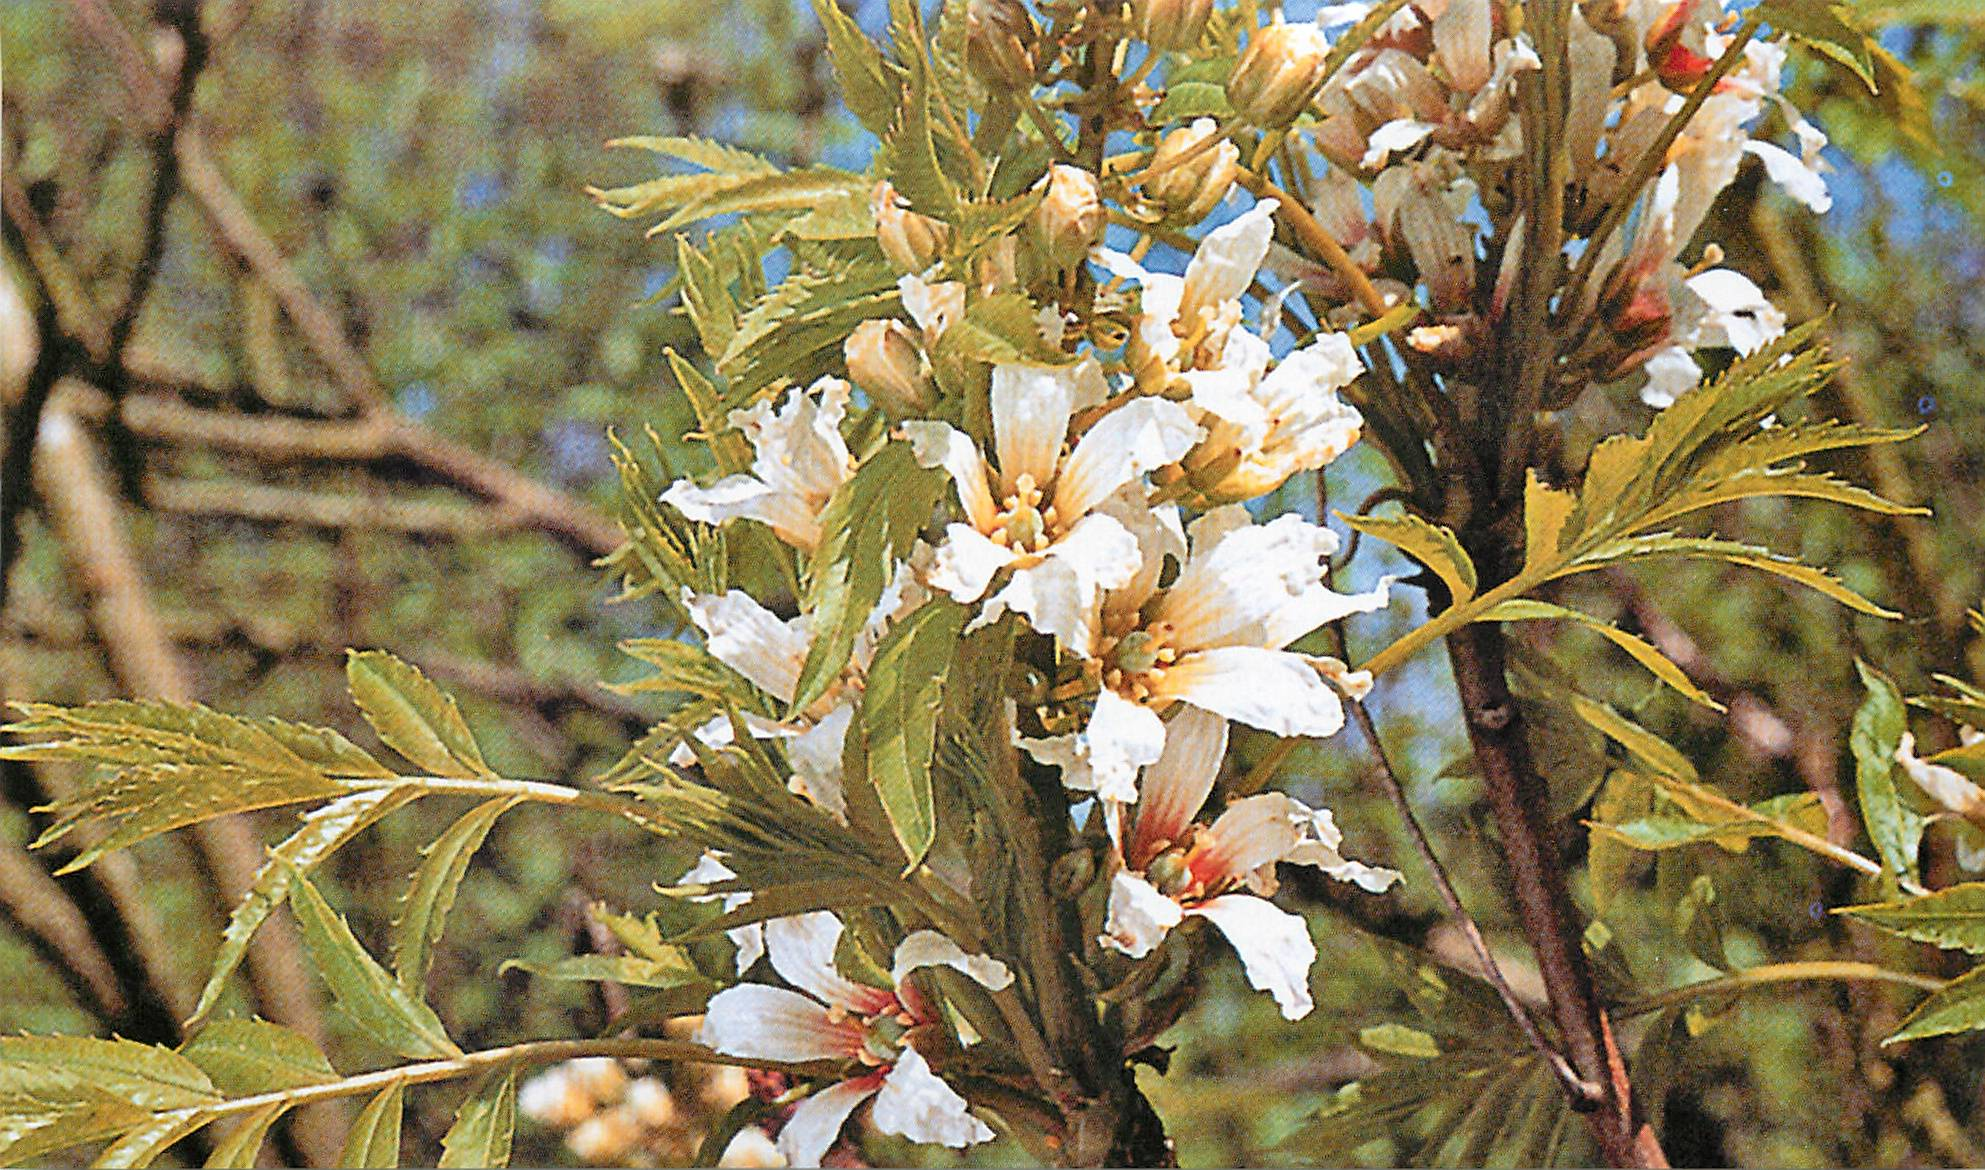 Чекалкин орех – китайское чудо | огородники